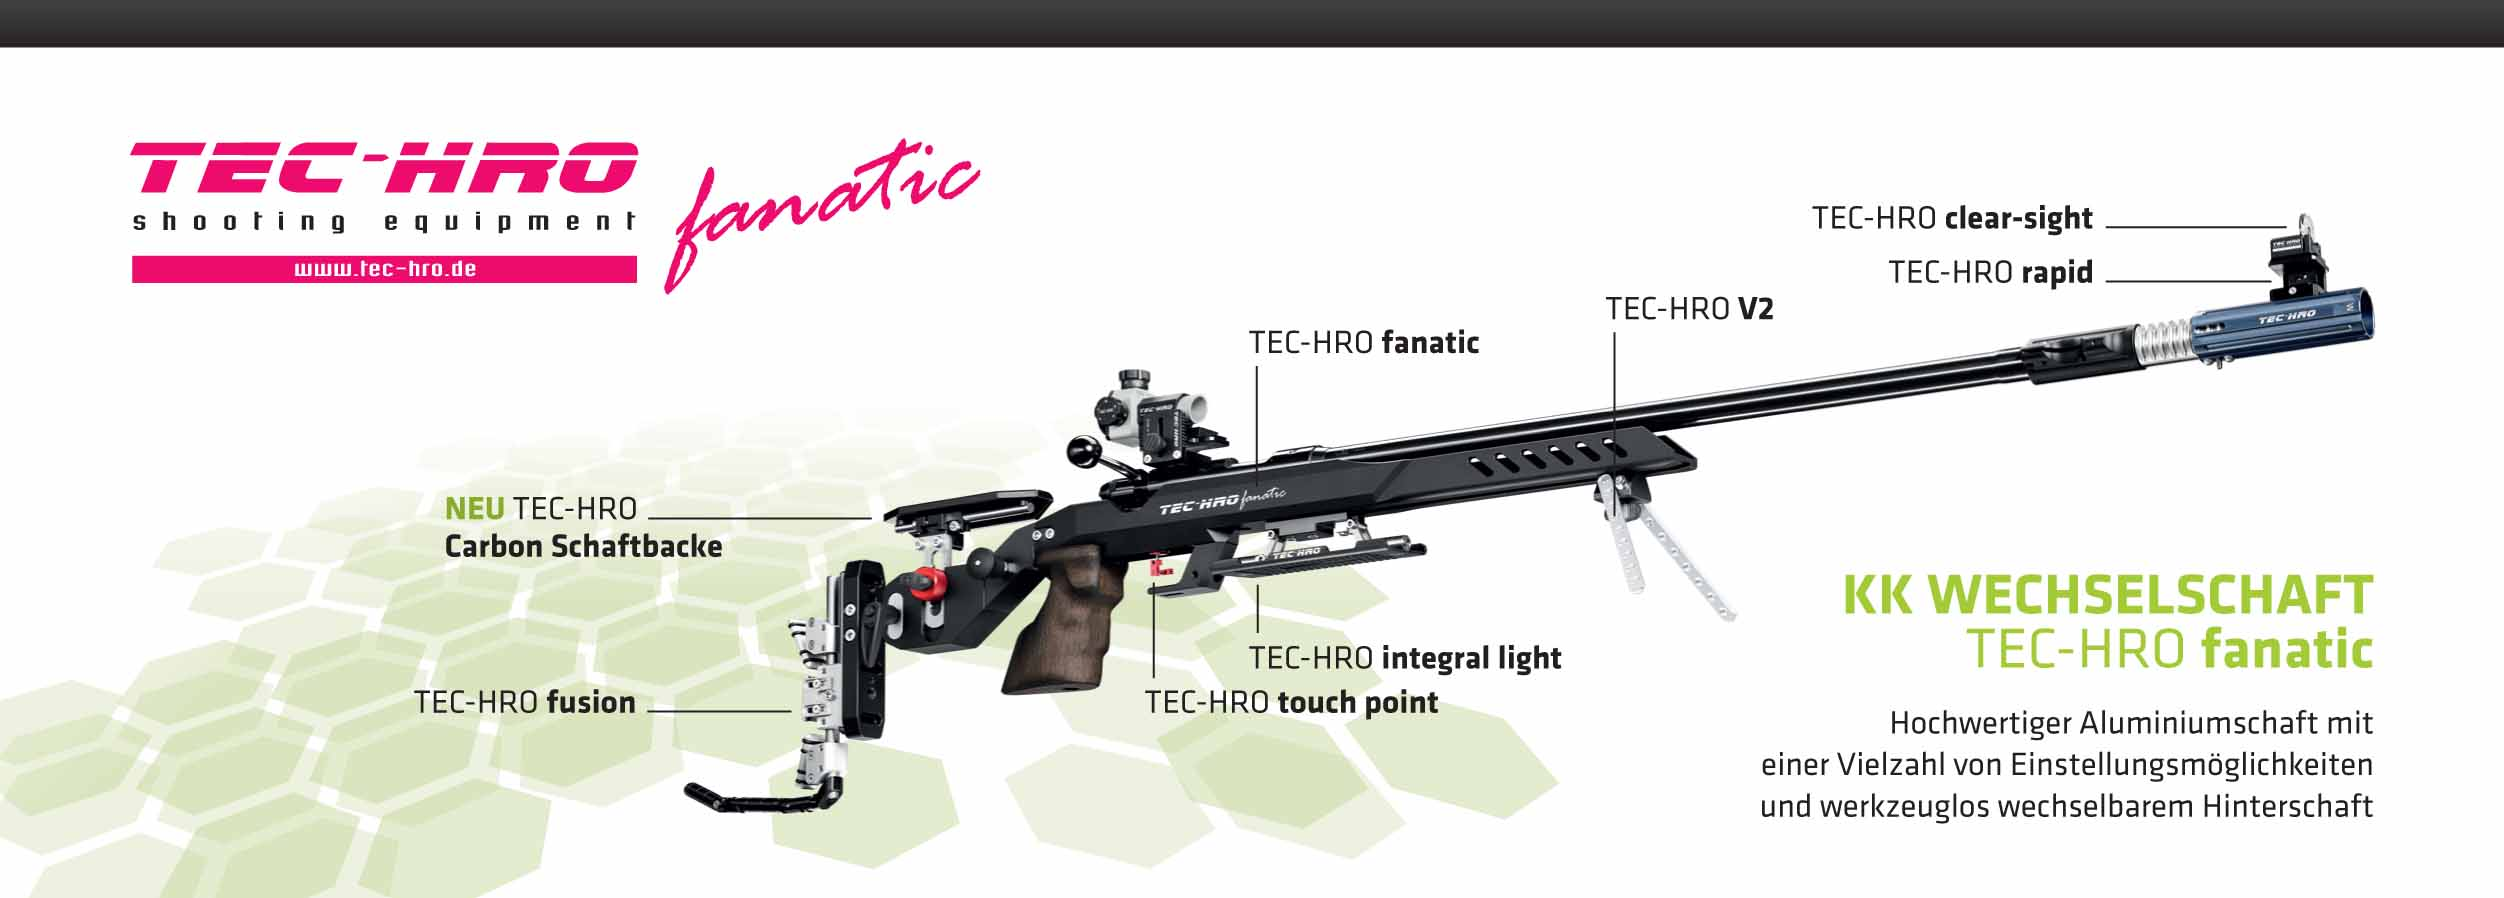 TEC-HRO Fanatic Alu-Schaft